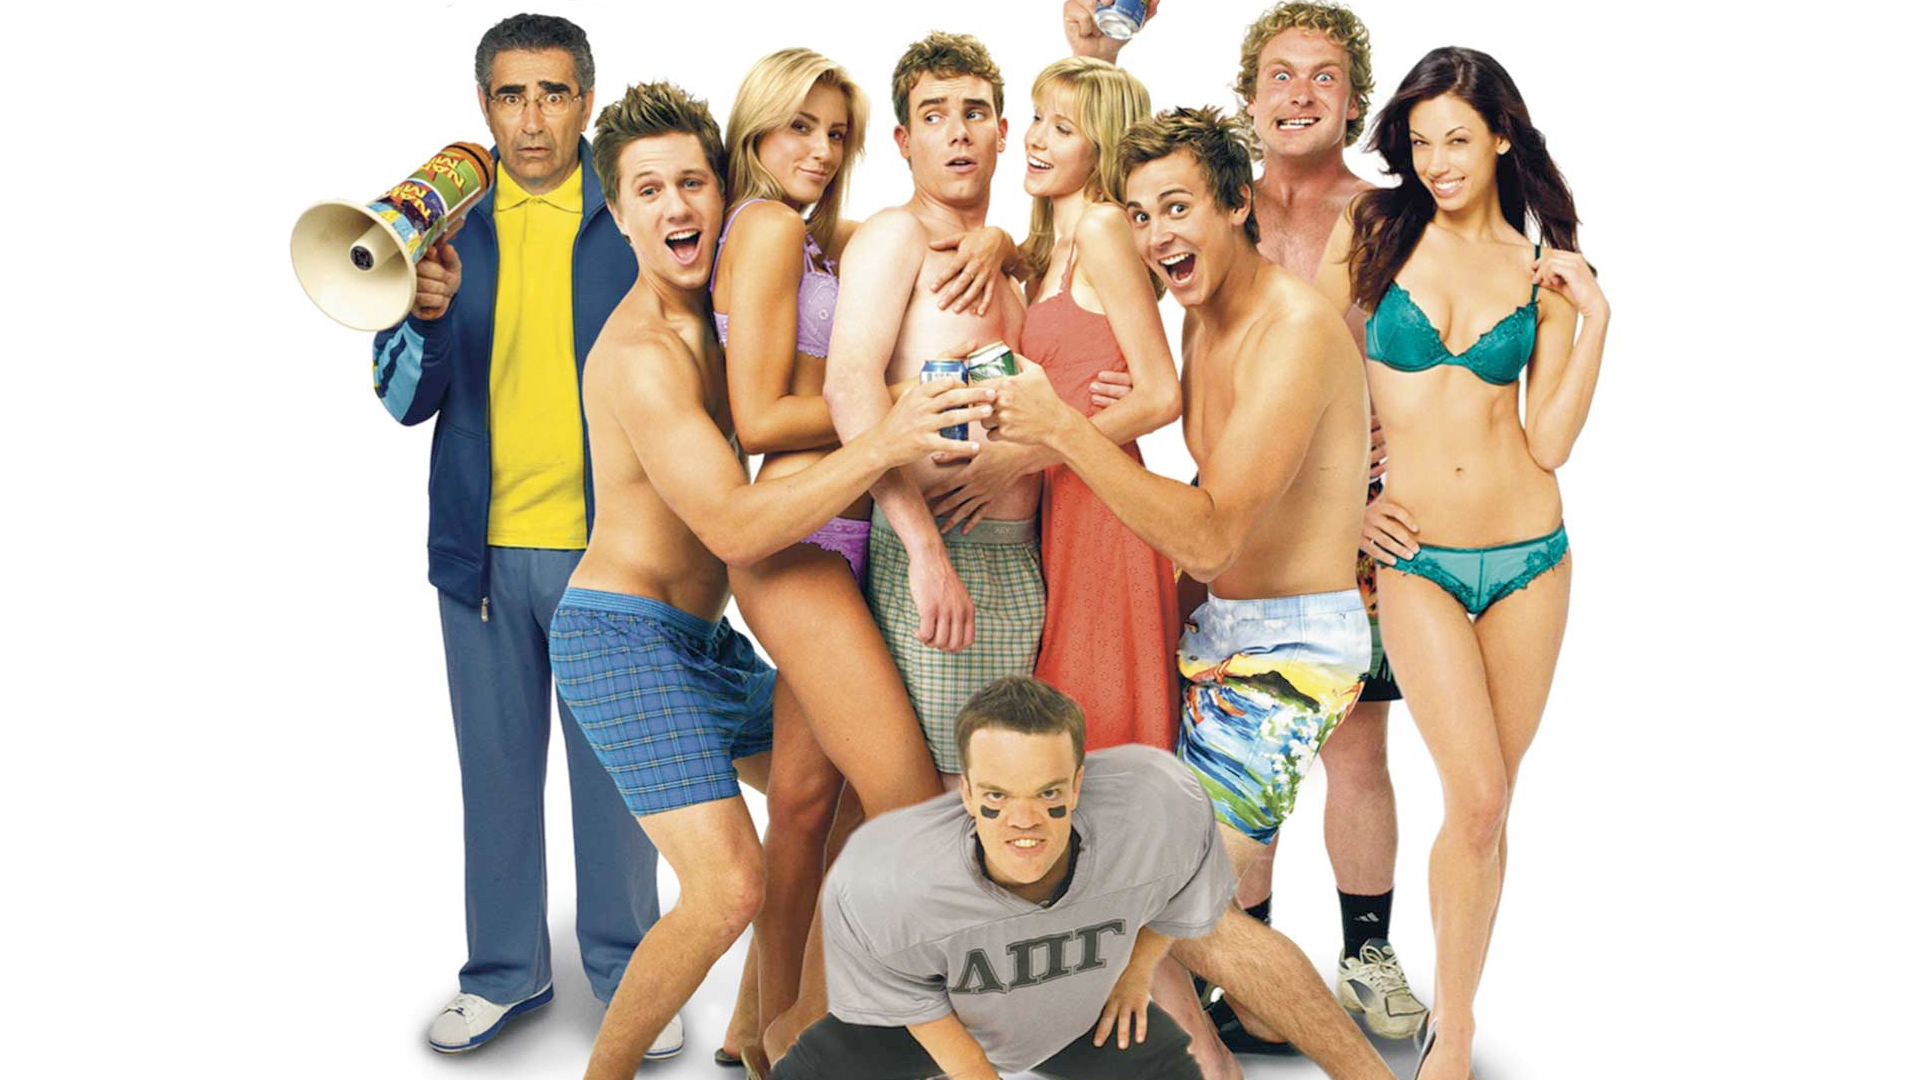 American pie naked mile movie reviews